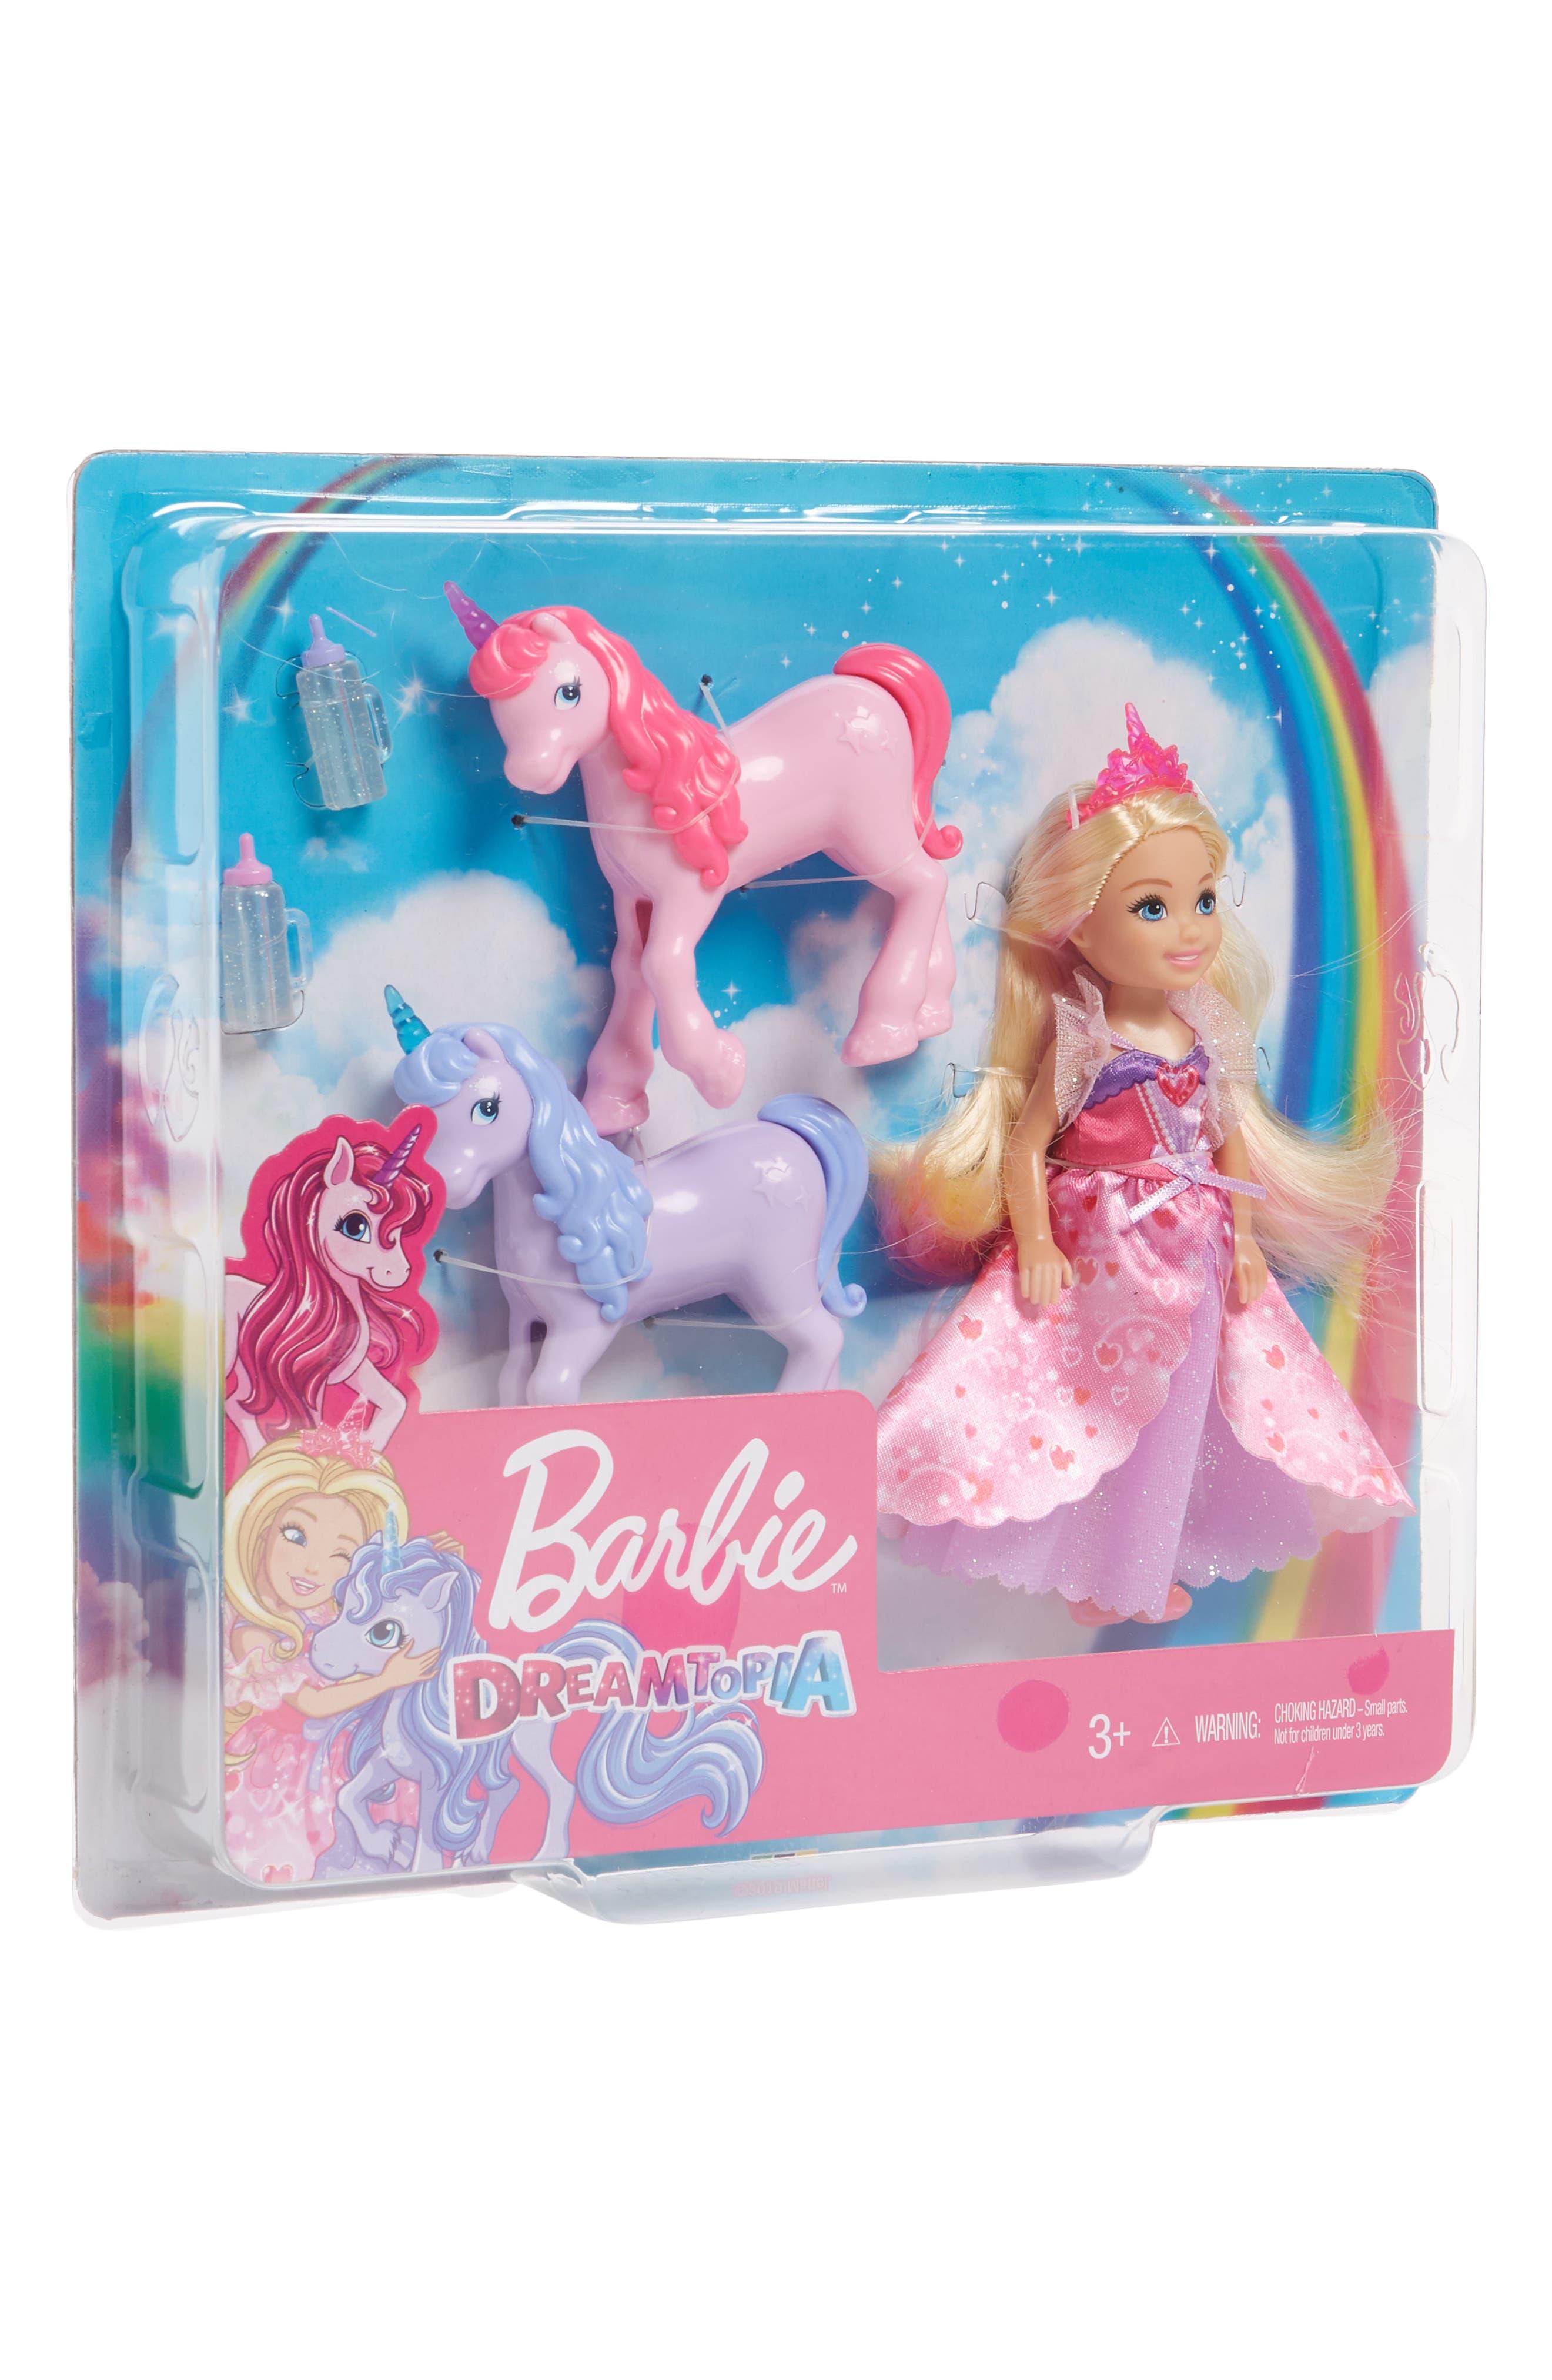 Barbie Dreamtopia Fairytale Dress-UP Doll /& Barbie Travel Chelsea Doll lot of 2.